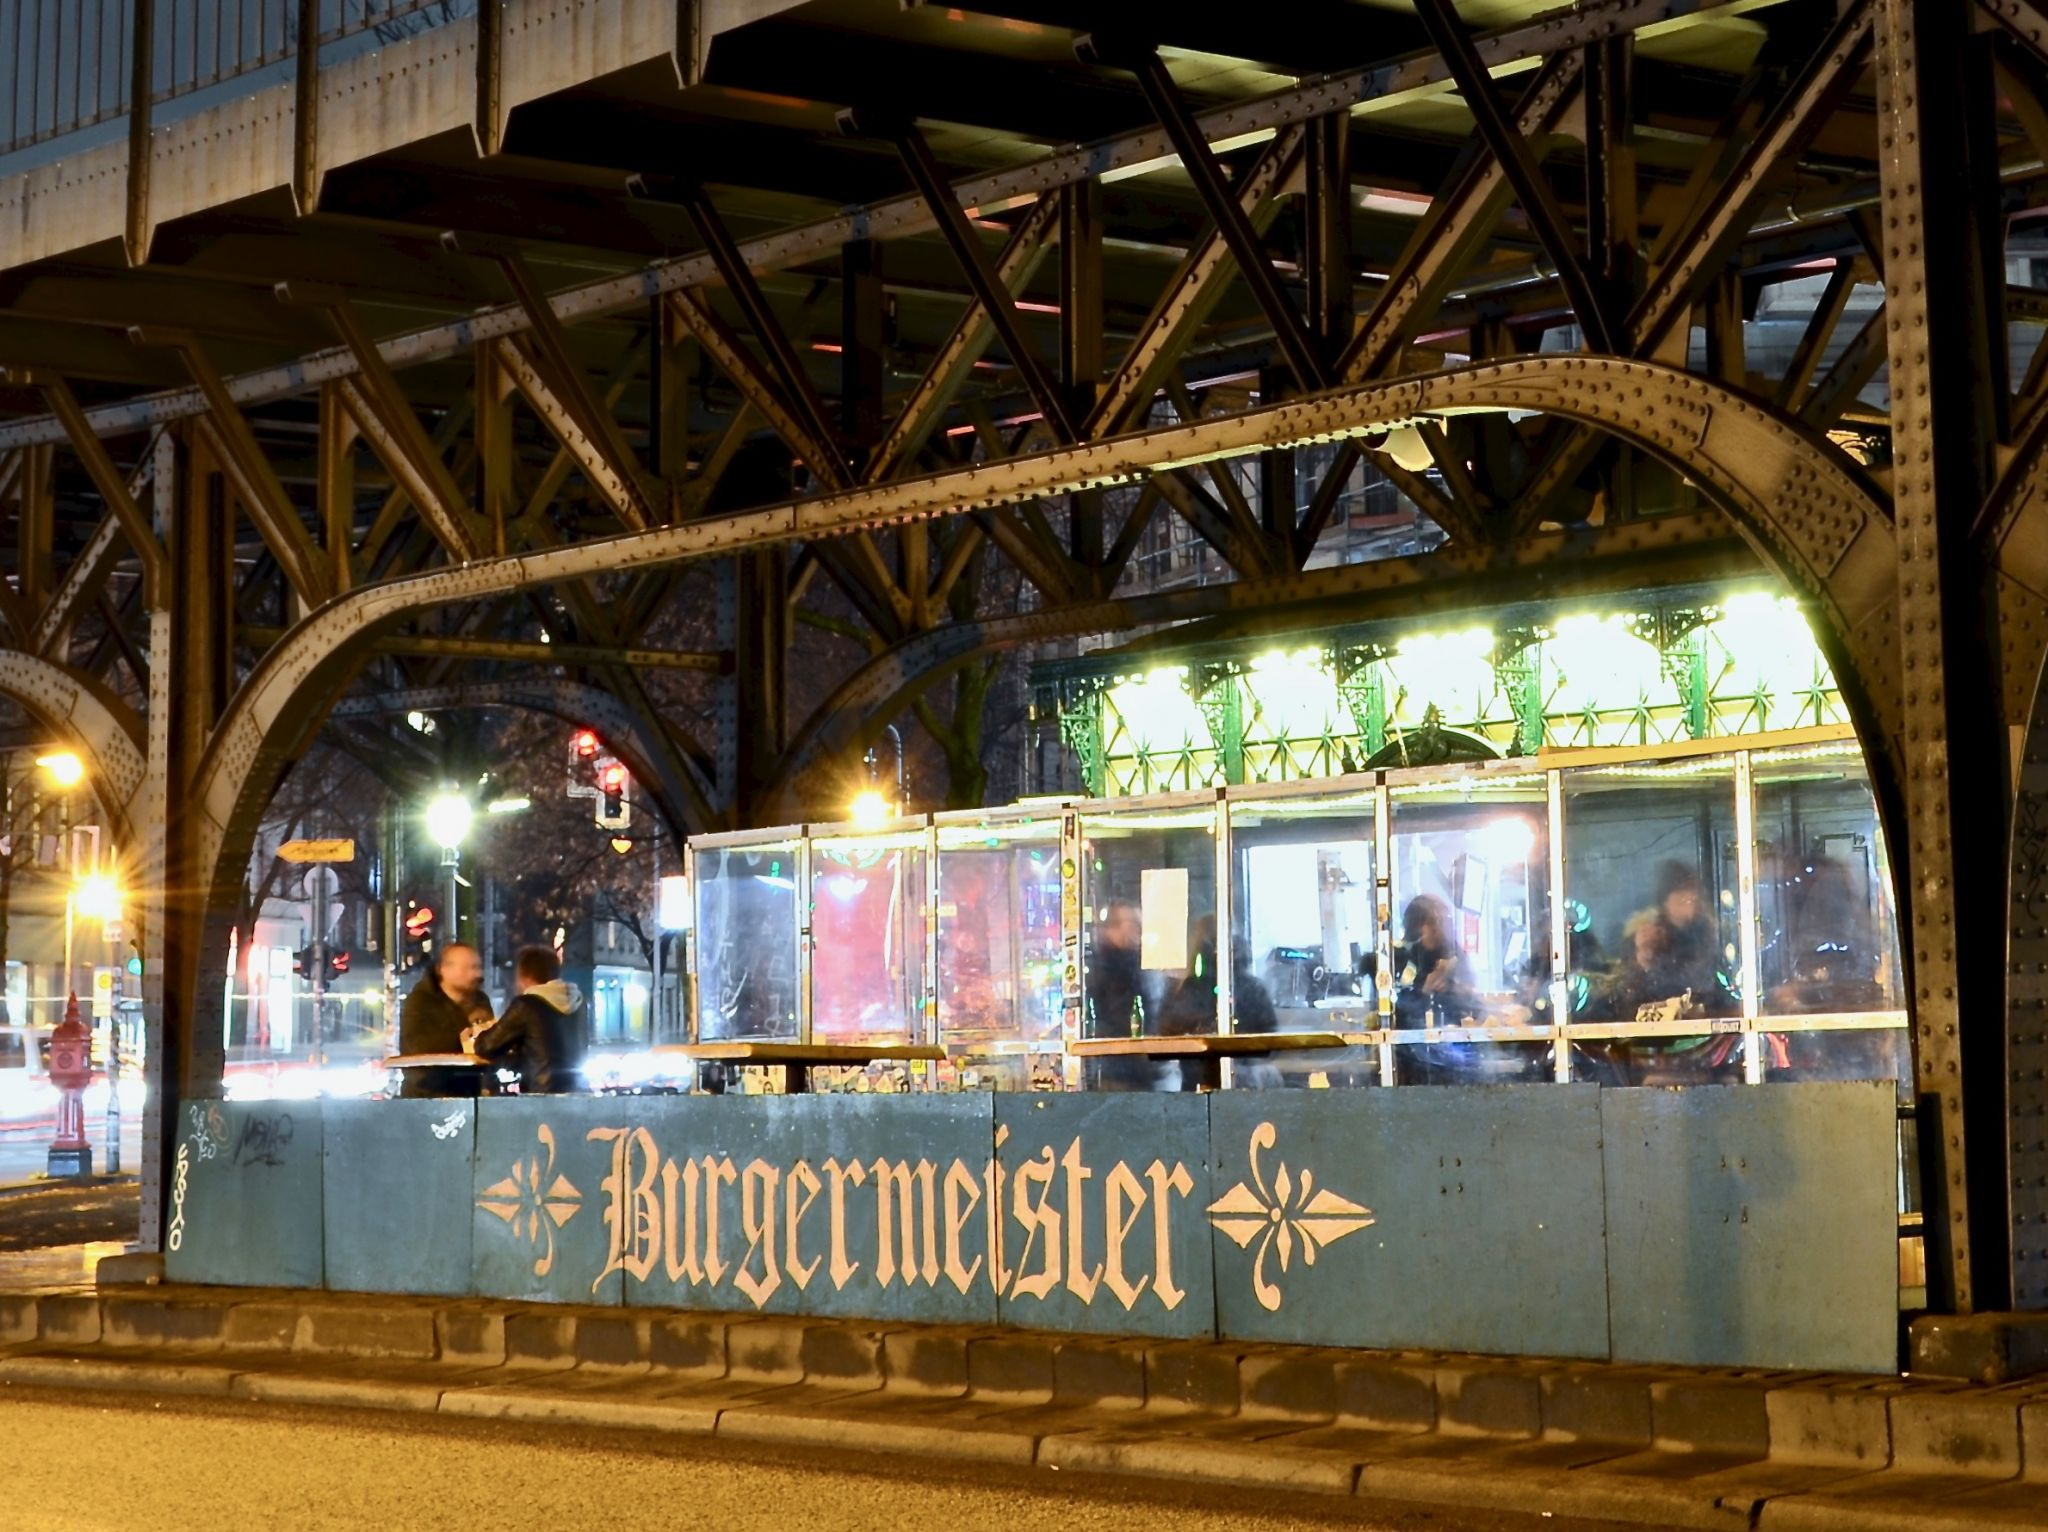 Burgermeister, Germany